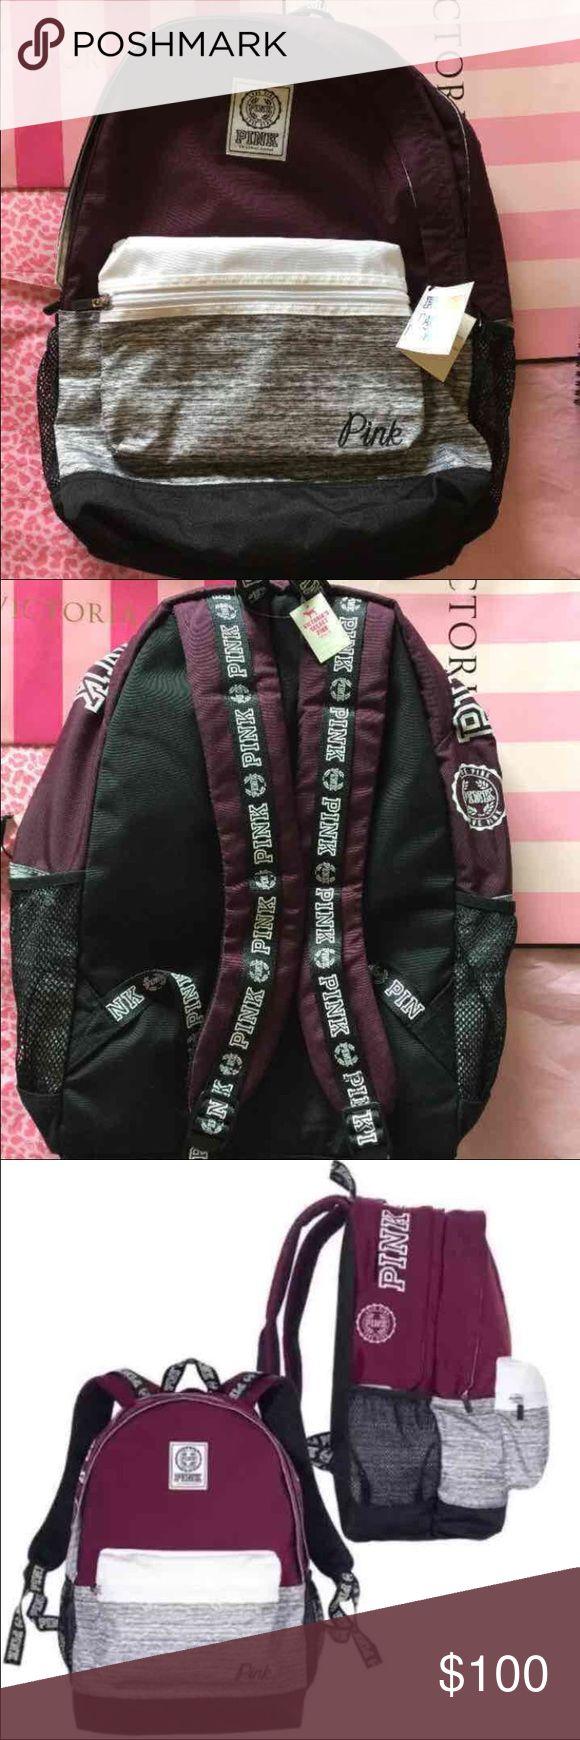 VS PINK BACKPACK Brand new VS PINK backpack - Maroon PINK Victoria's Secret Bags Backpacks